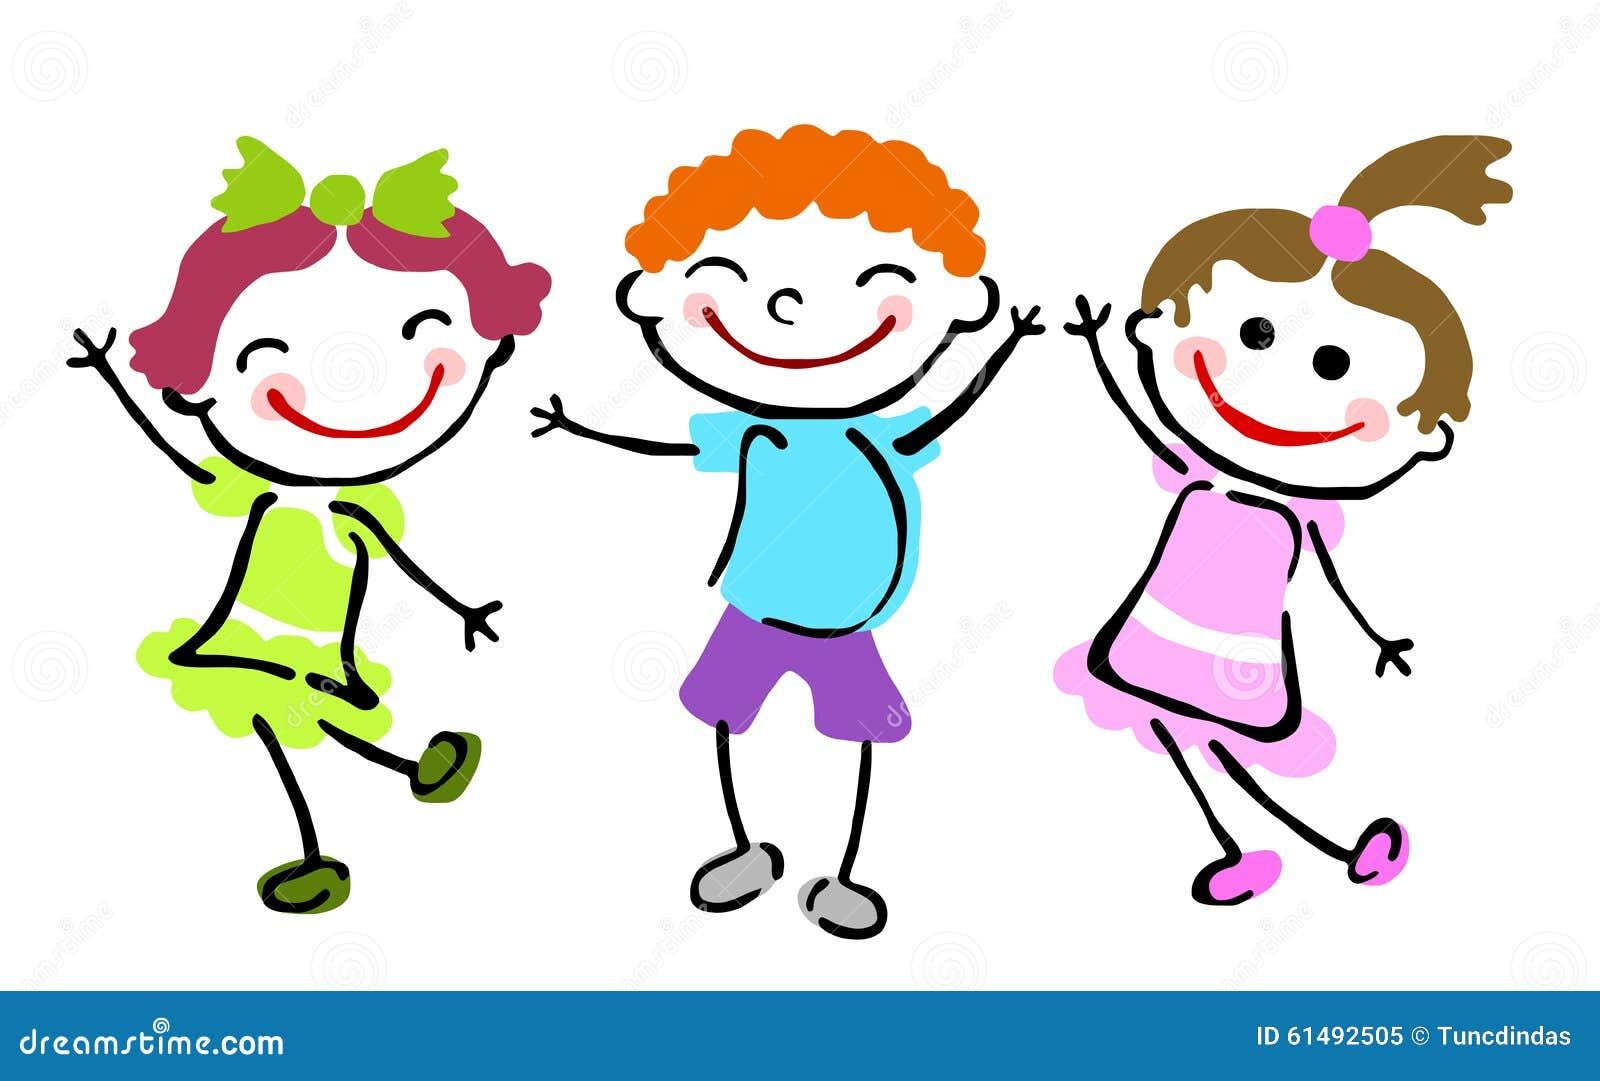 Best Friends Group Children Stock Illustrations – 91 Best Friends